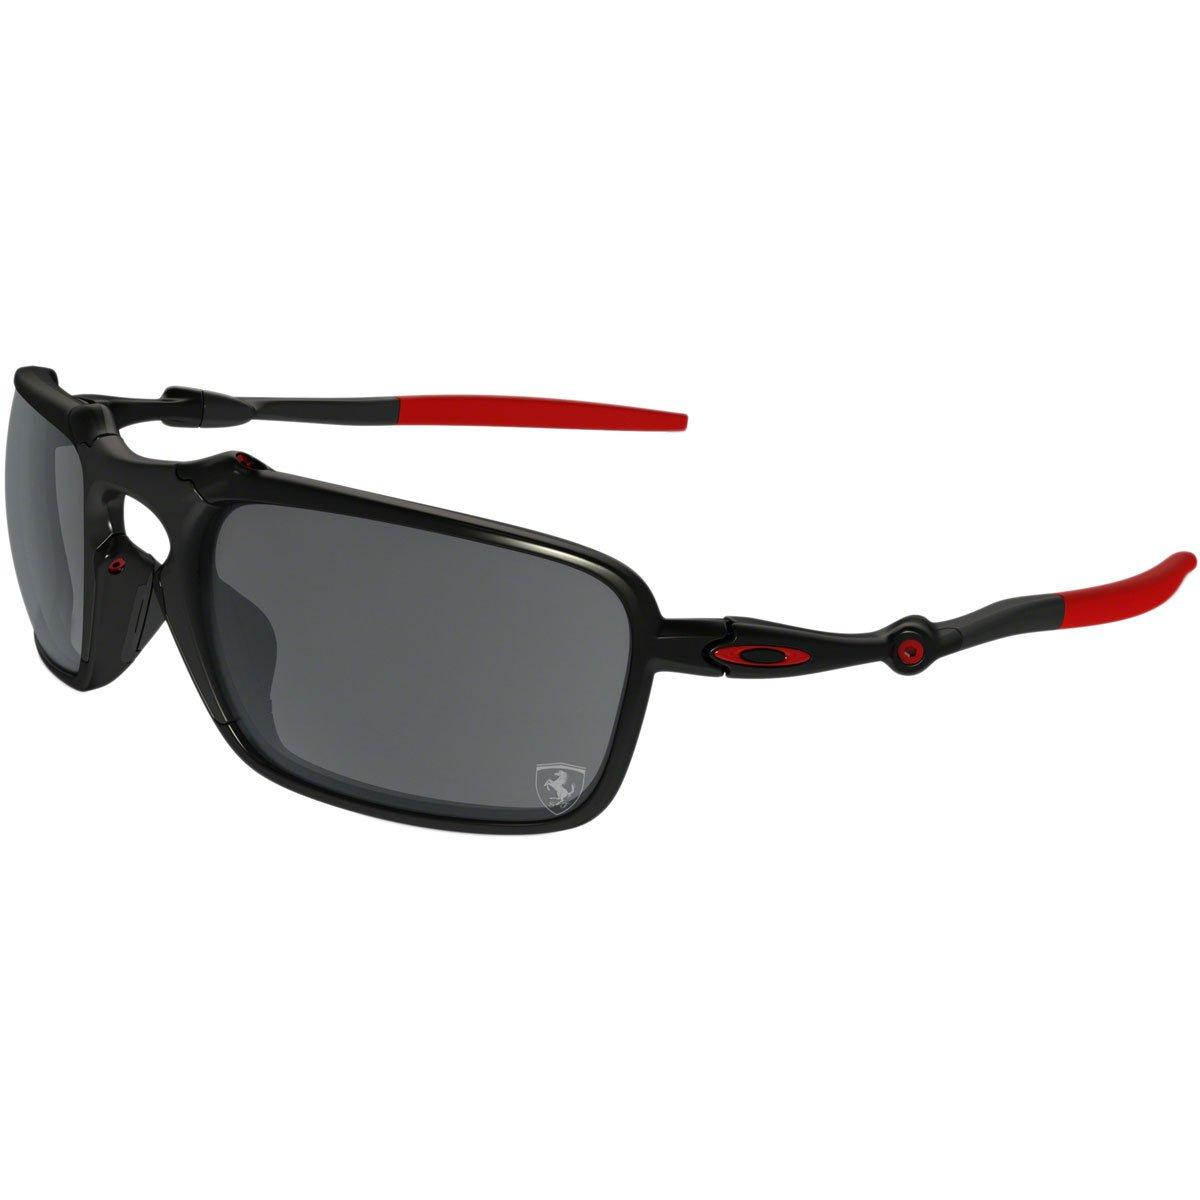 881b8c36e89 Amazon.com: Oakley Mens Badman Ferrari Sunglasses One Size Dark ...